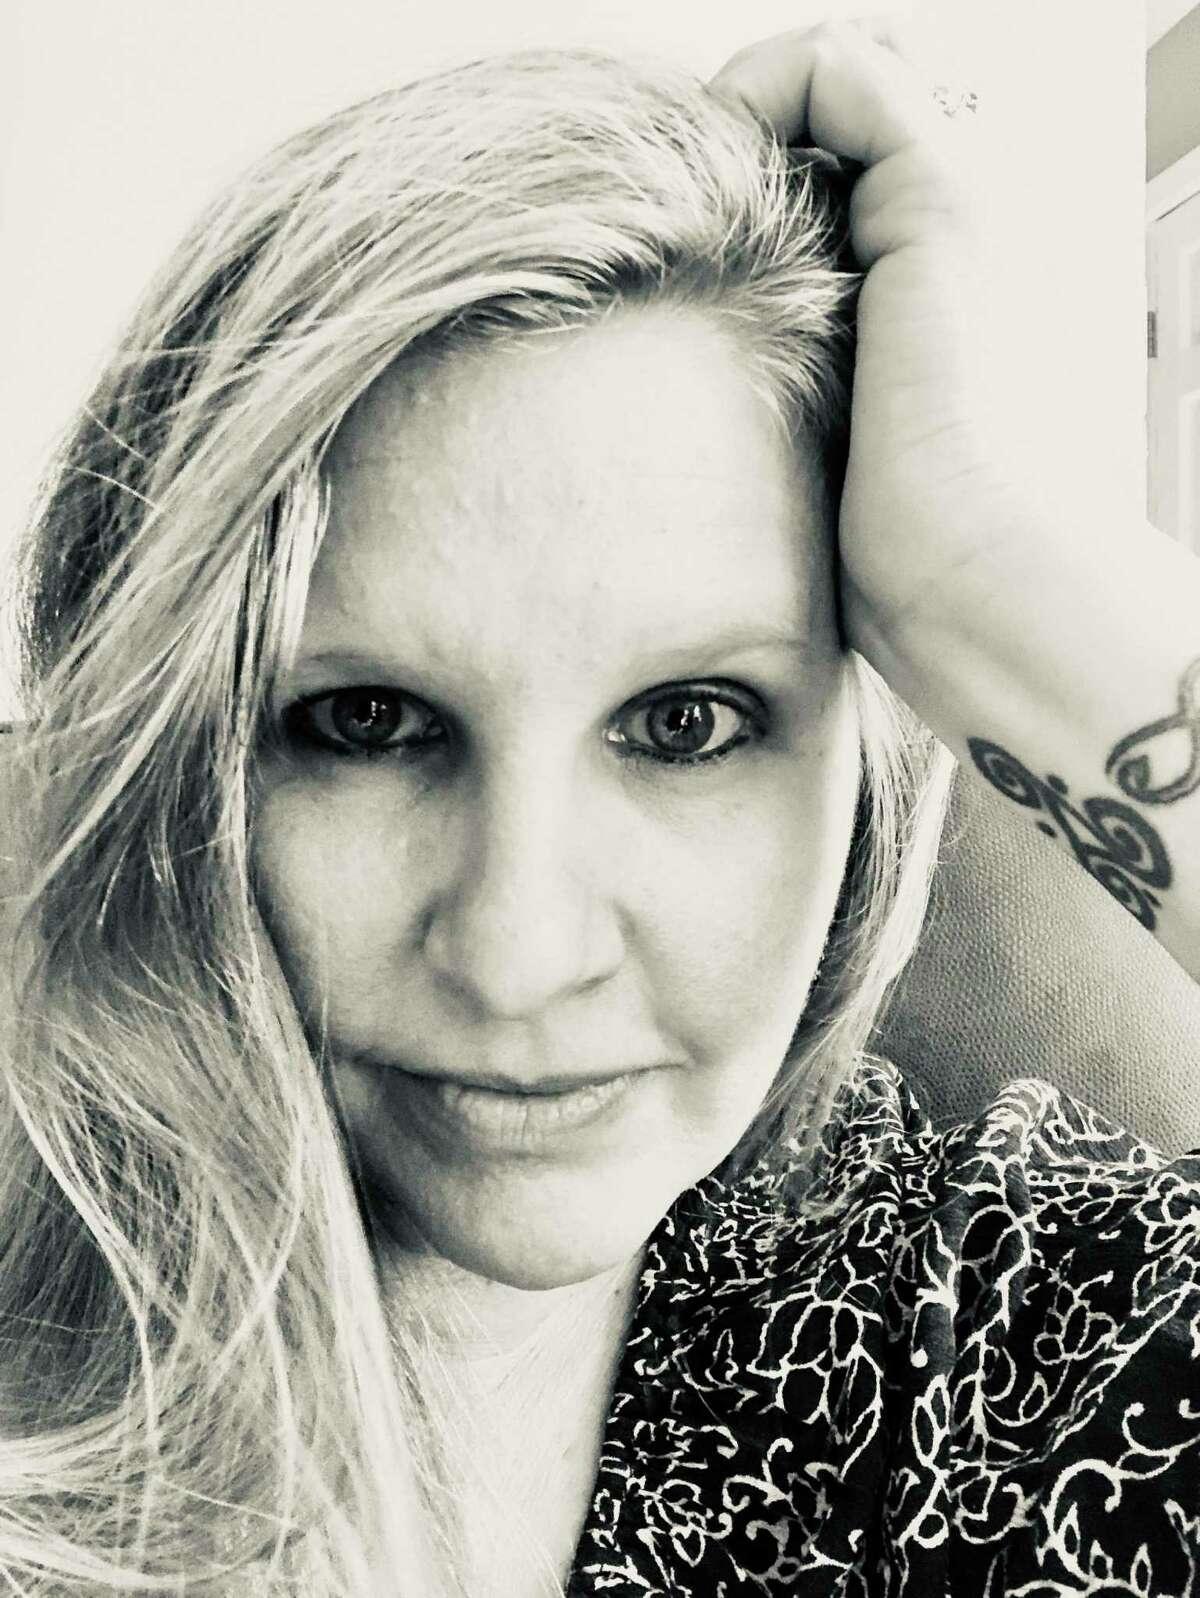 Kristin Ward is a K-5 STEM coach in Danbury Public Schools who has self-published three young adult novels.